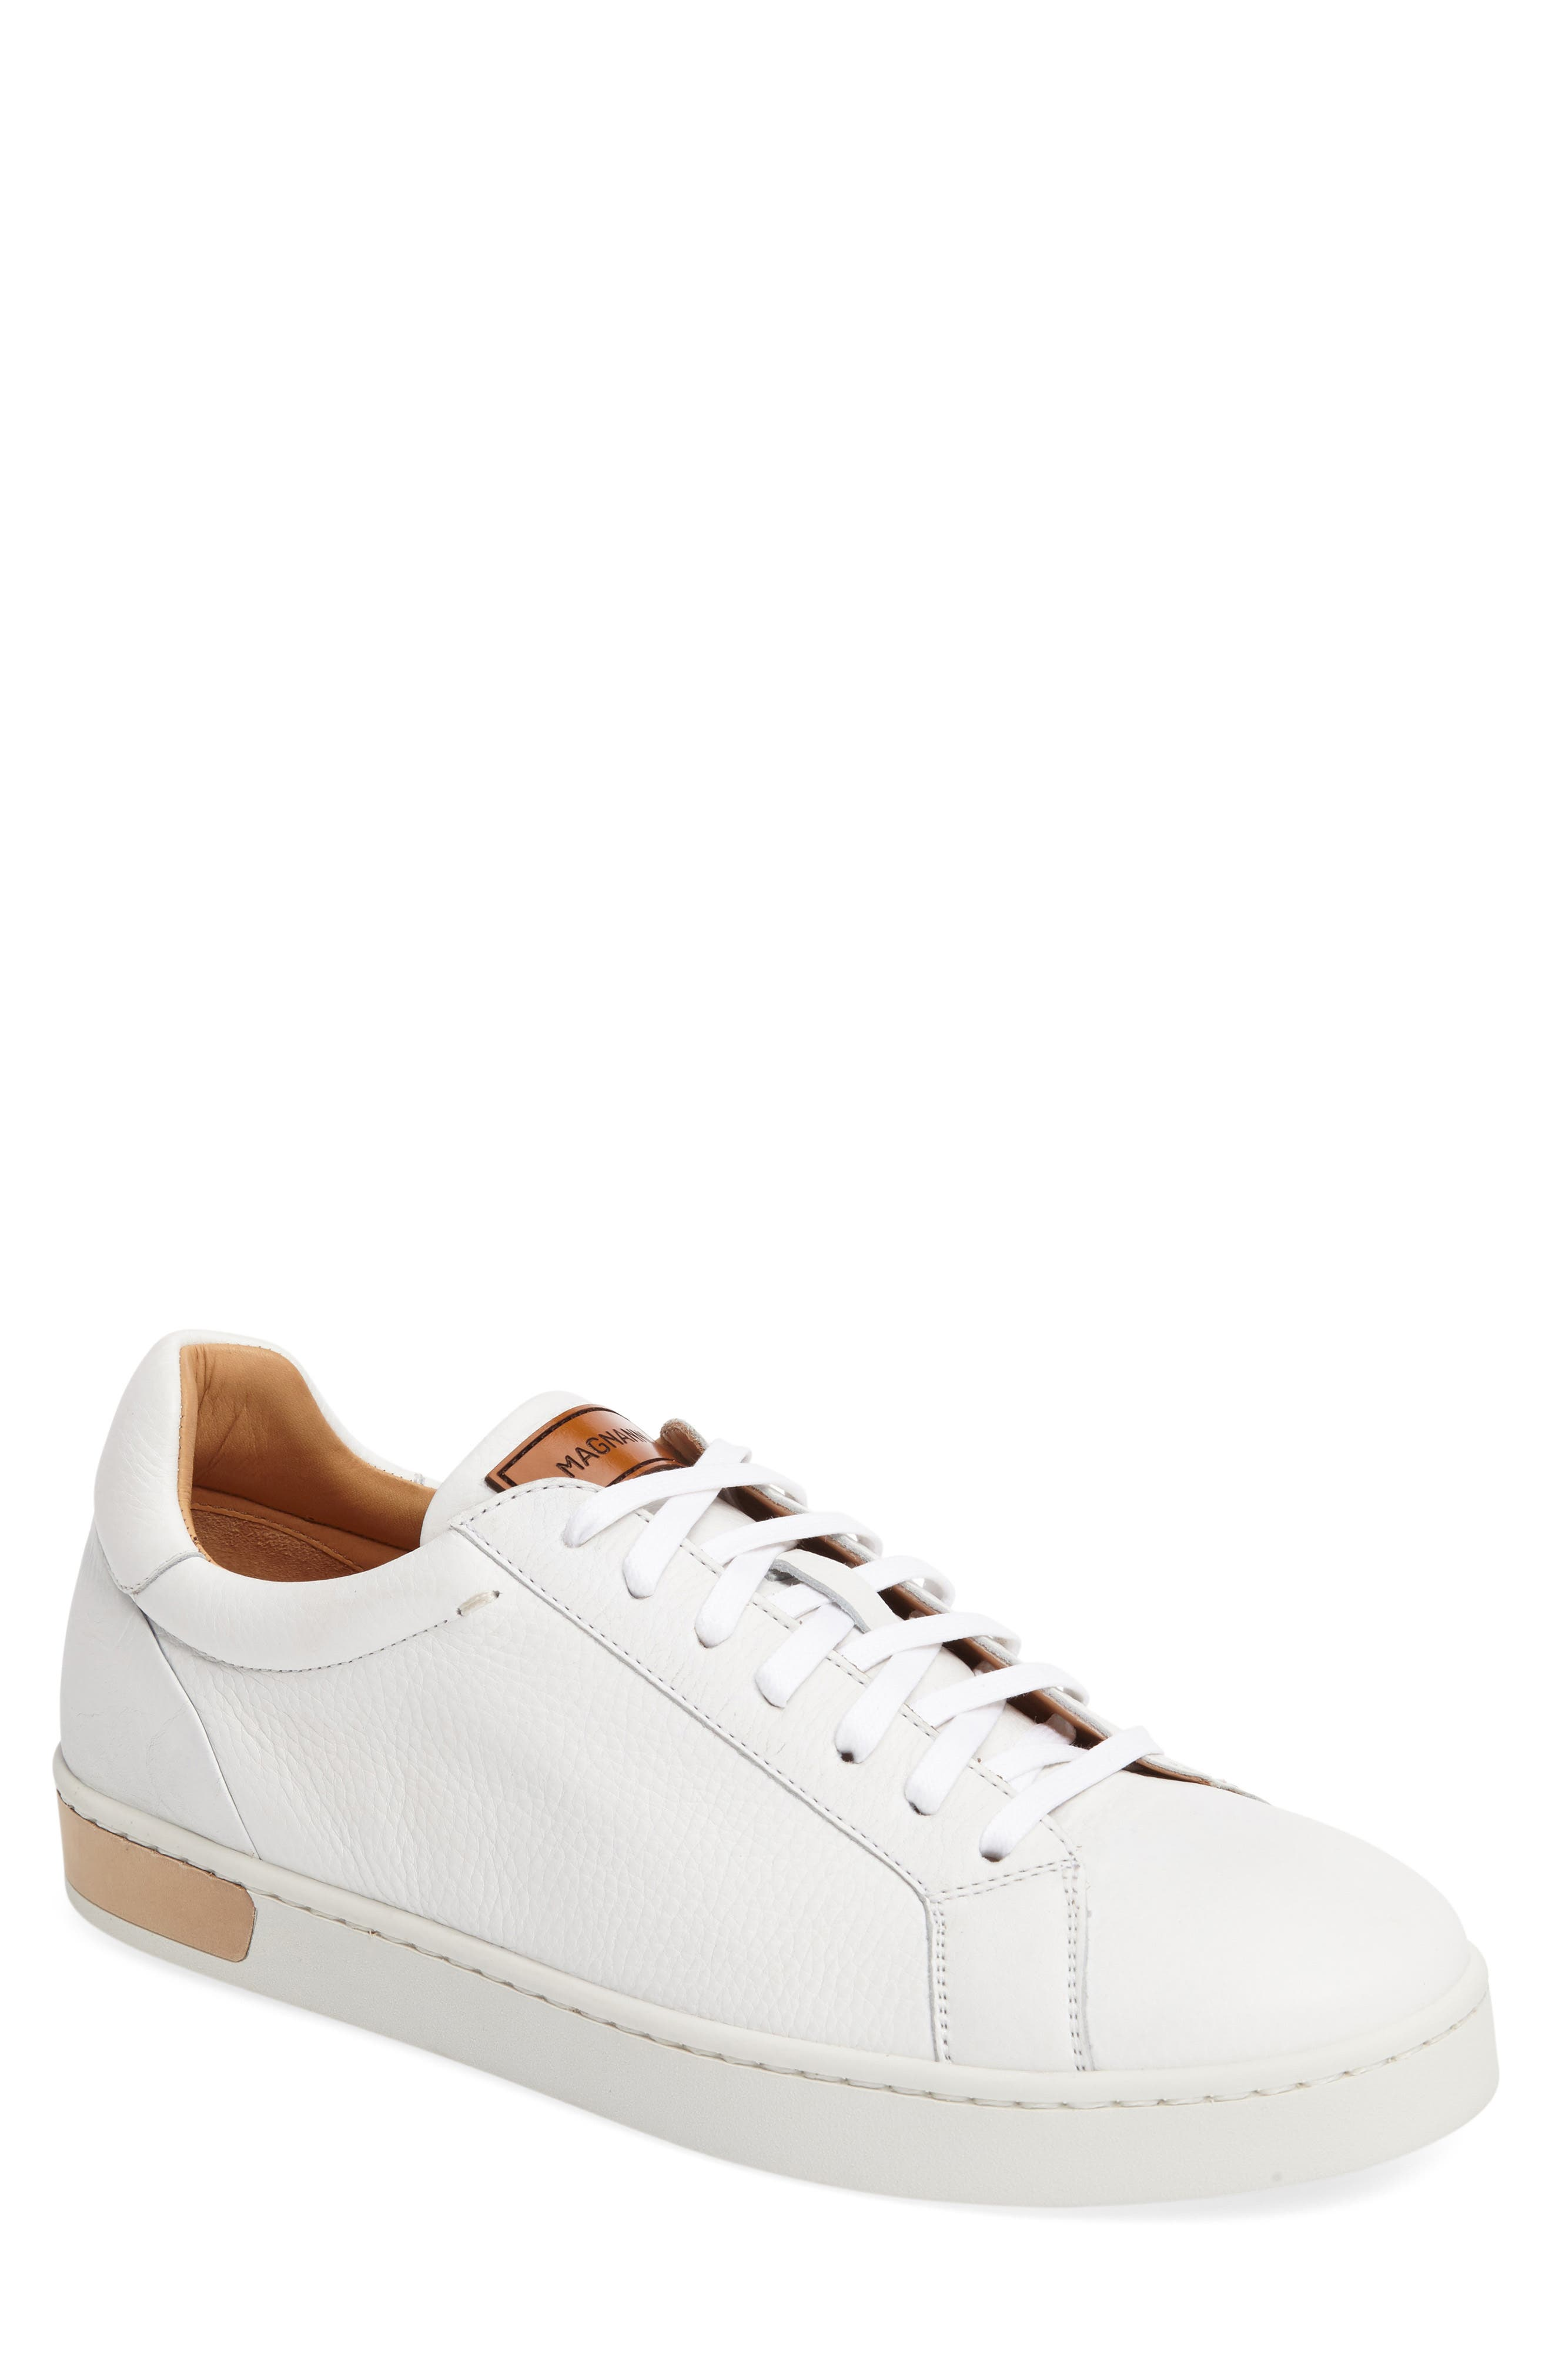 Caballero Sneaker,                             Main thumbnail 1, color,                             White Leather